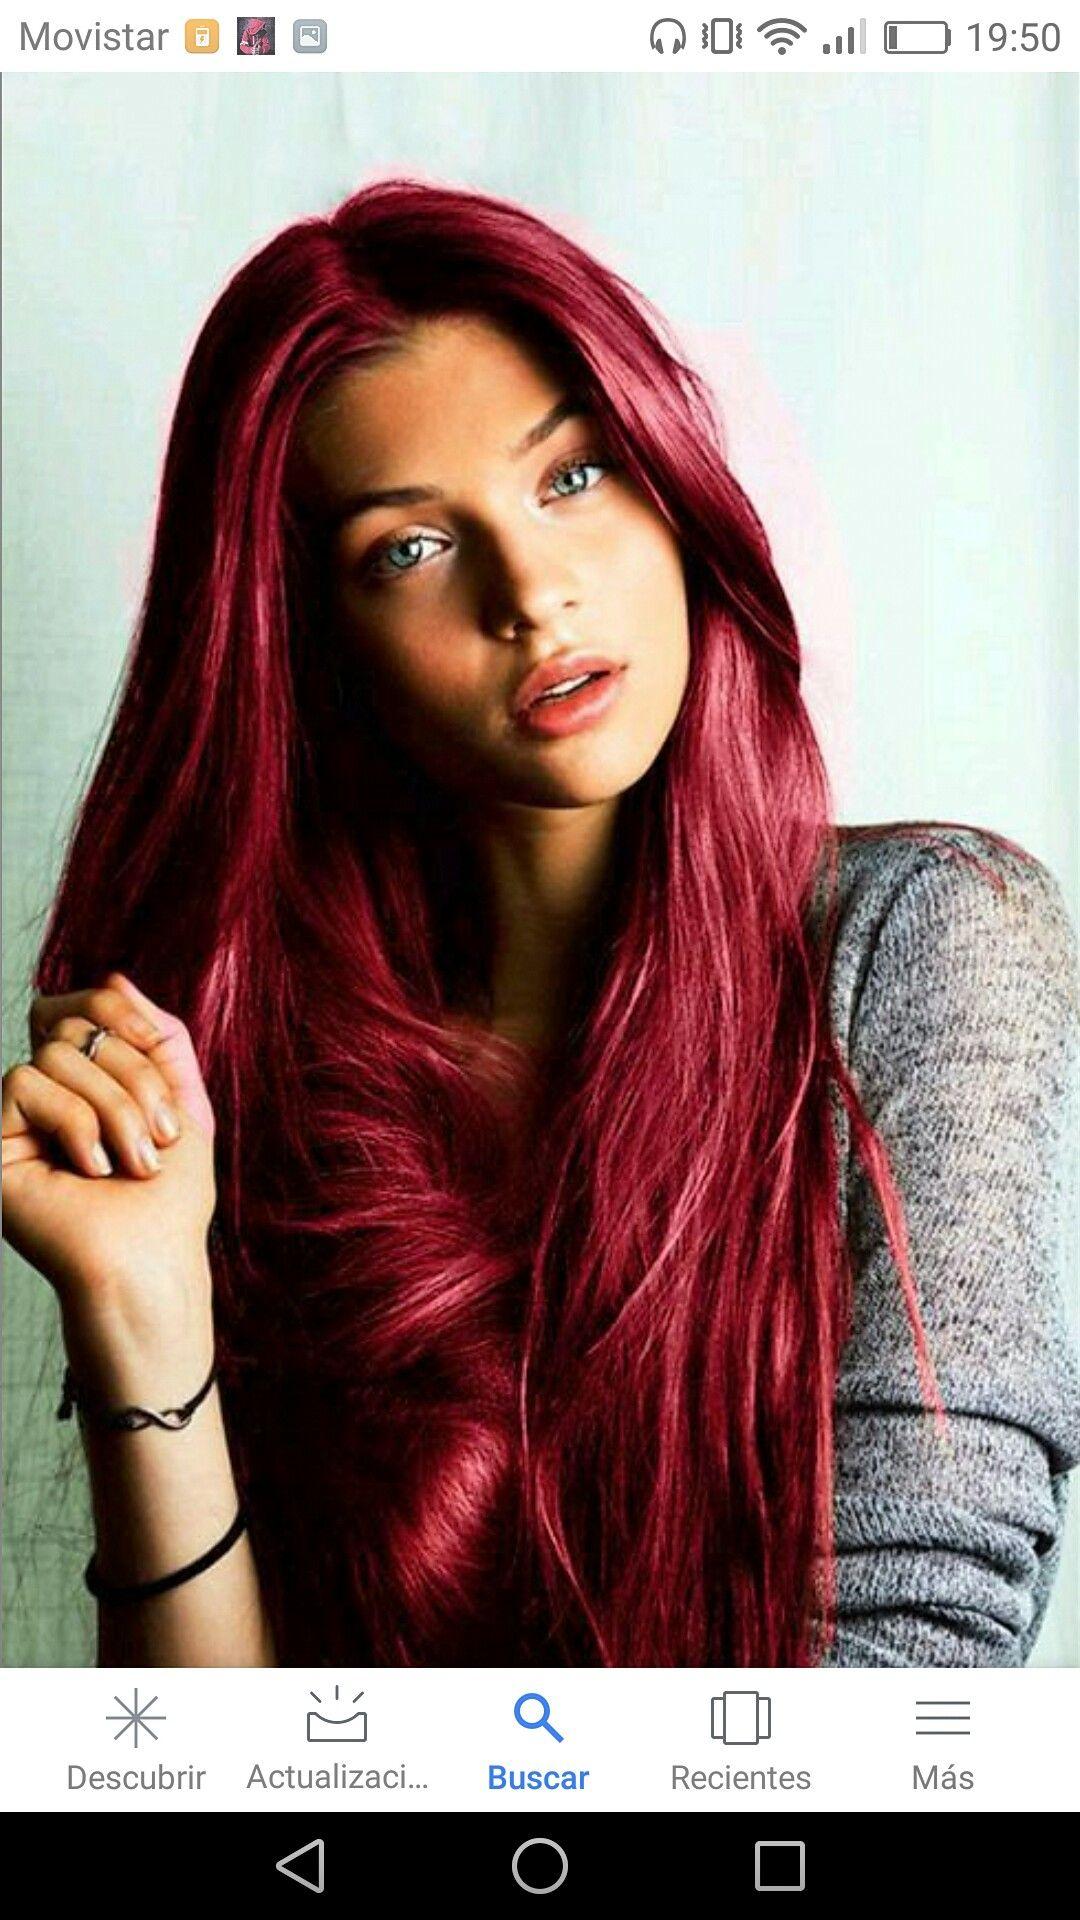 Morenas con cabello color rojo